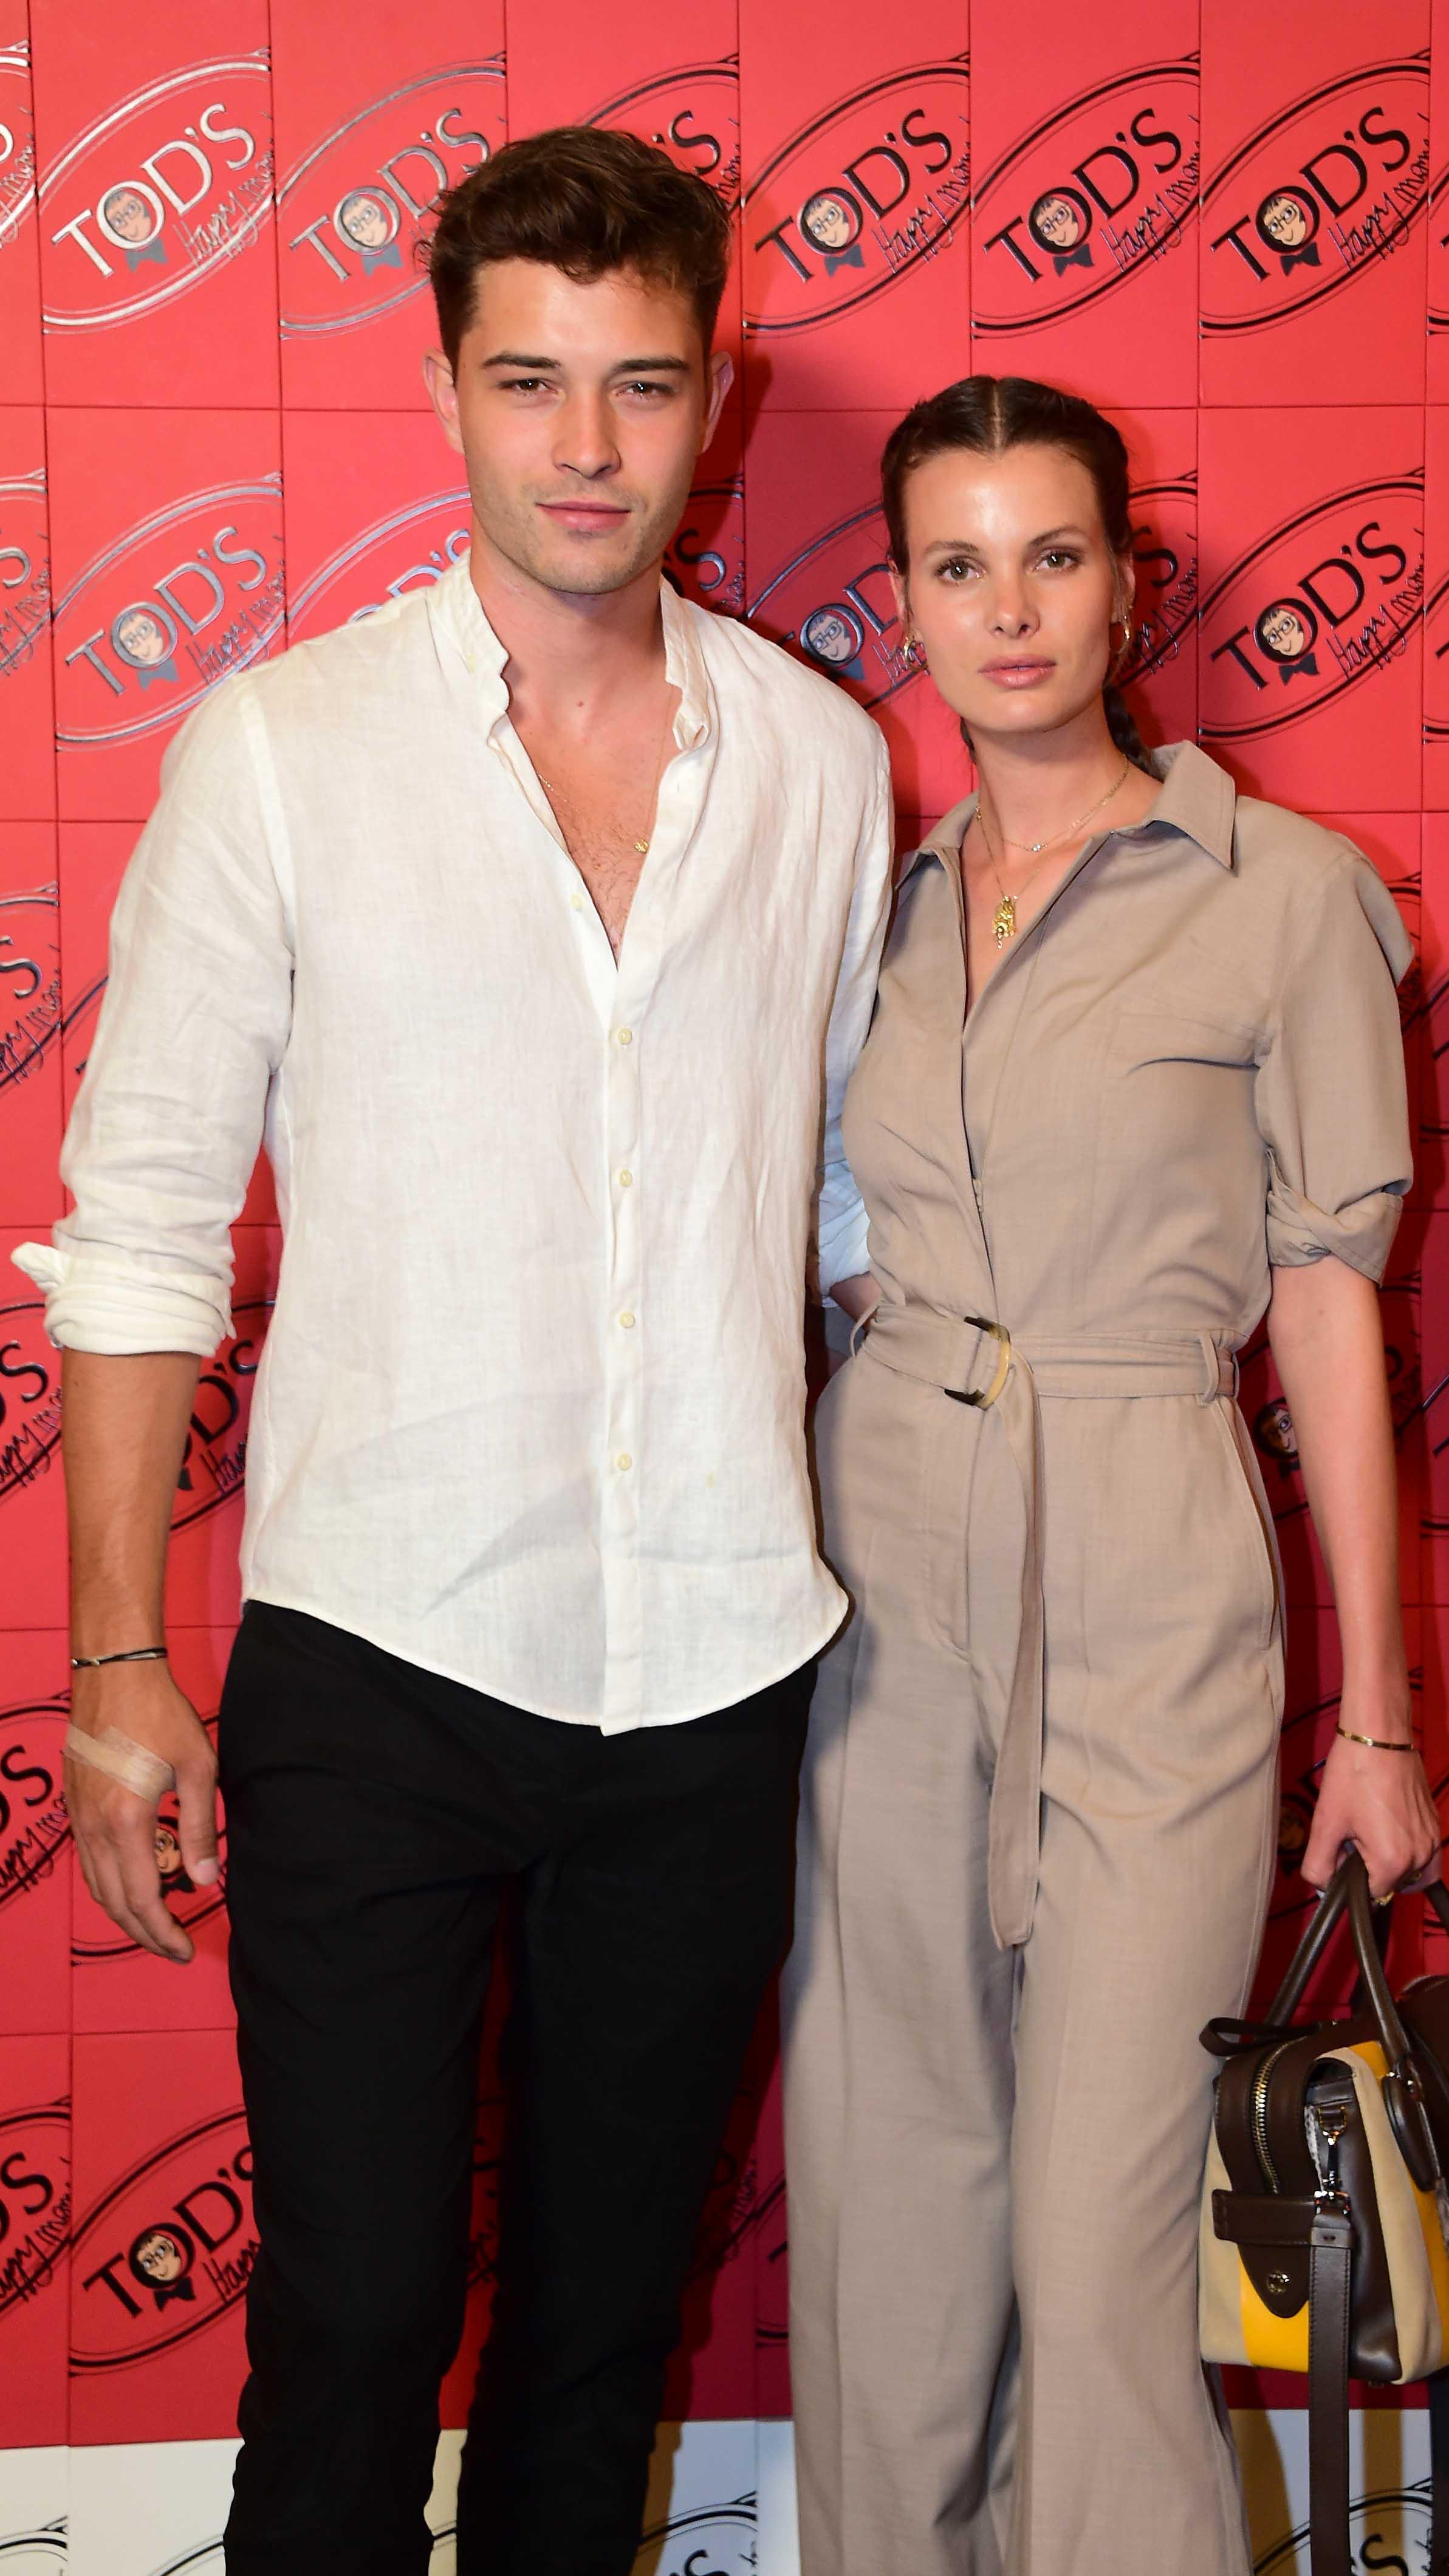 Francisco Lachowski et Jessian Gravel